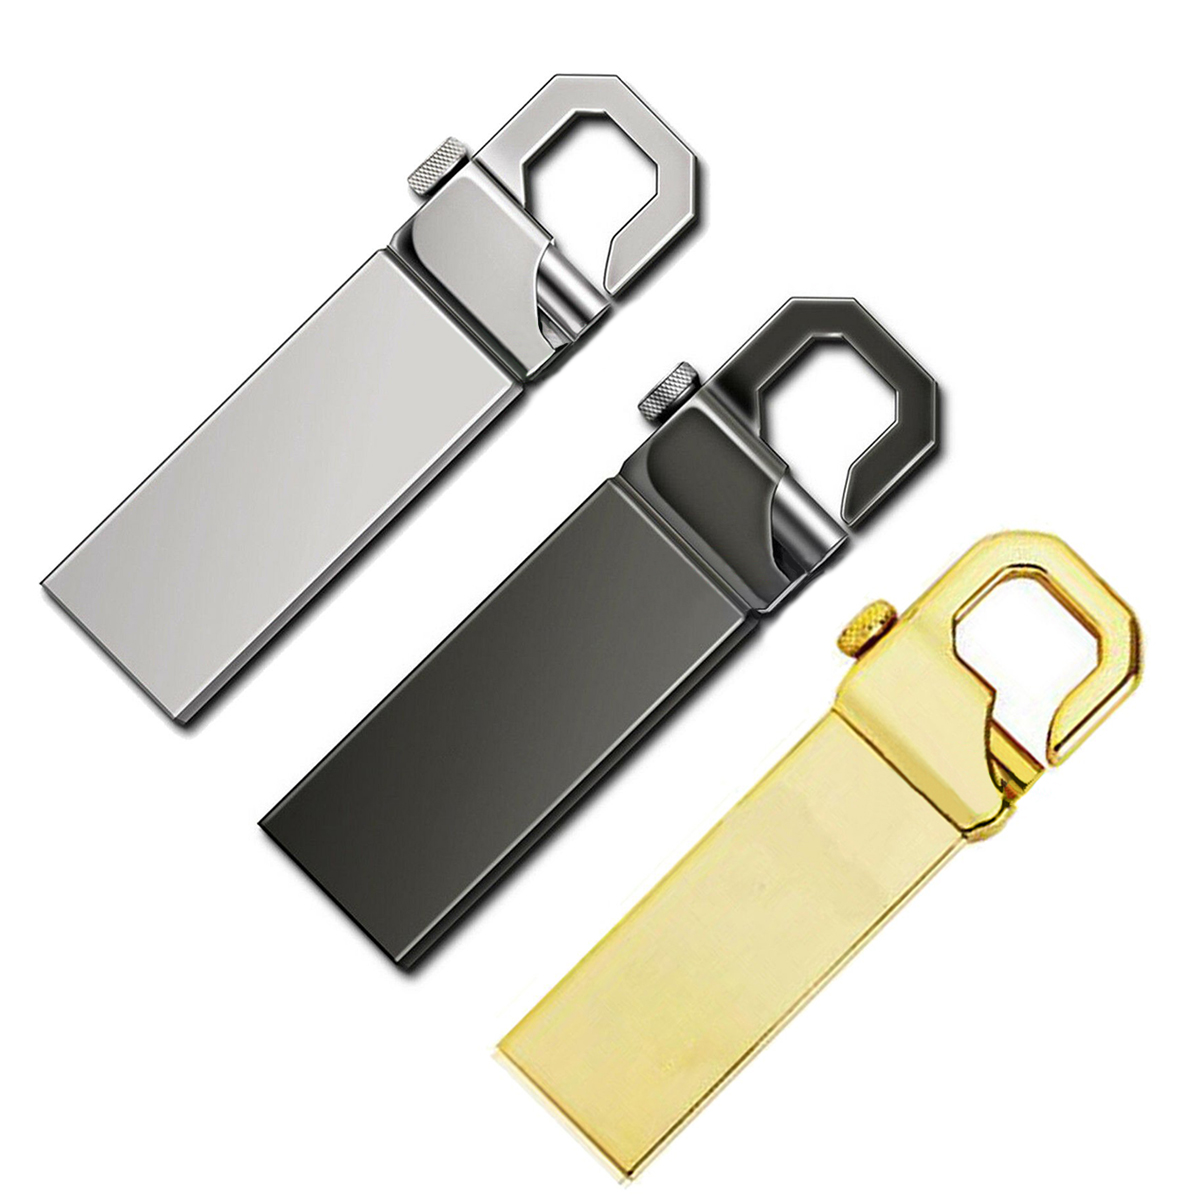 USB Flash Drive Memory Stick Storage Thumb Key U Disk USB 2.0 USB Flash Drives High Speed Reading And Writing For PC Laptop